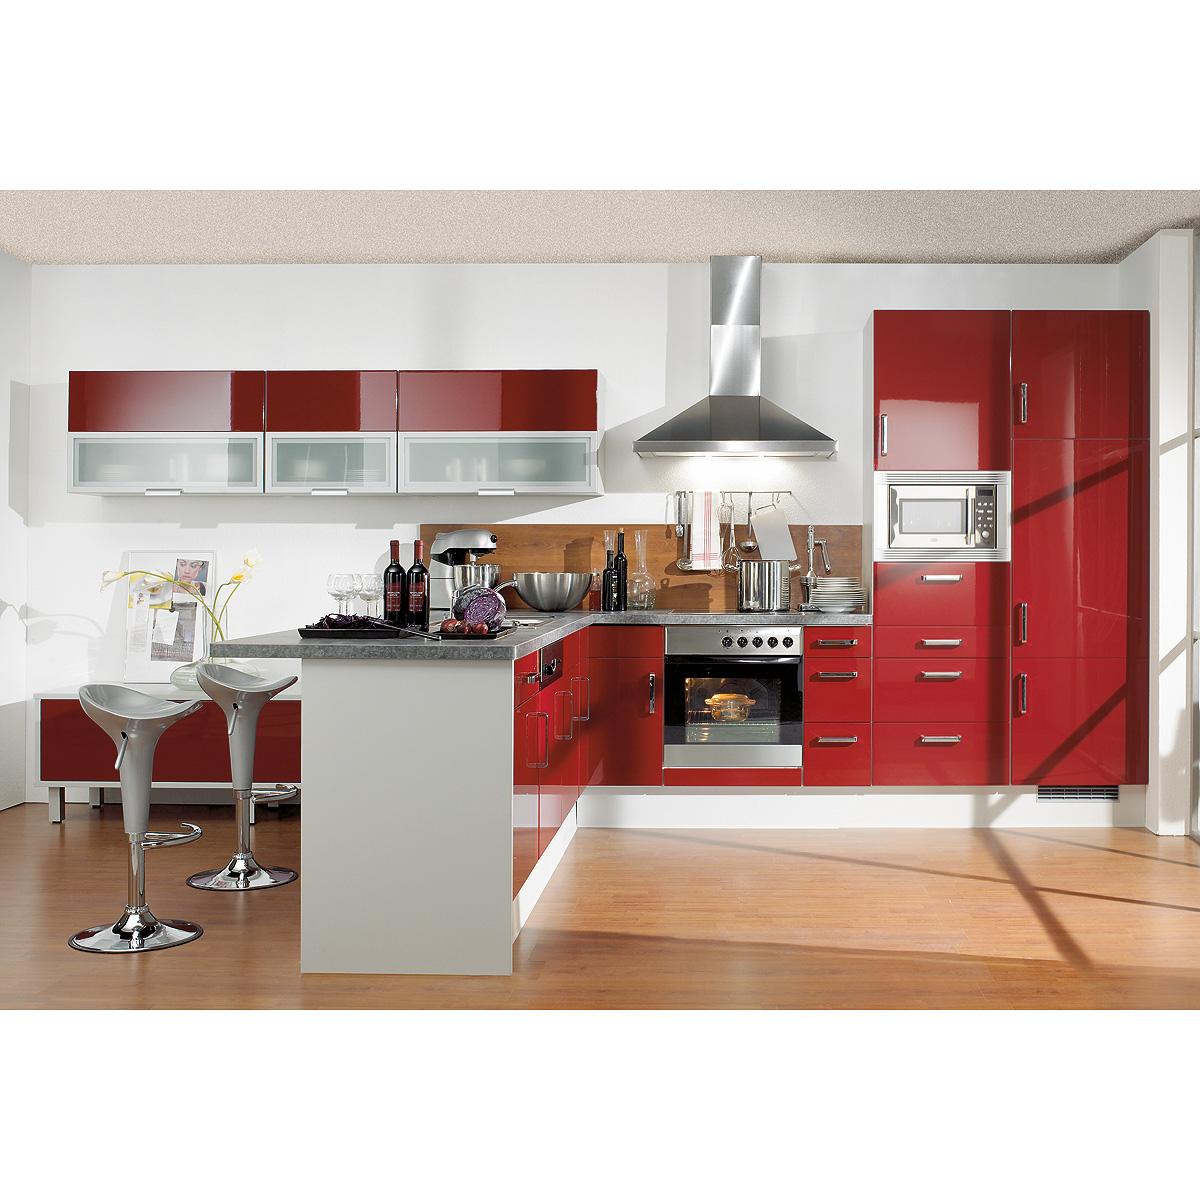 brigitte k che einbauk che l k che inkl e ger te mit vielen farben 606 ebay. Black Bedroom Furniture Sets. Home Design Ideas